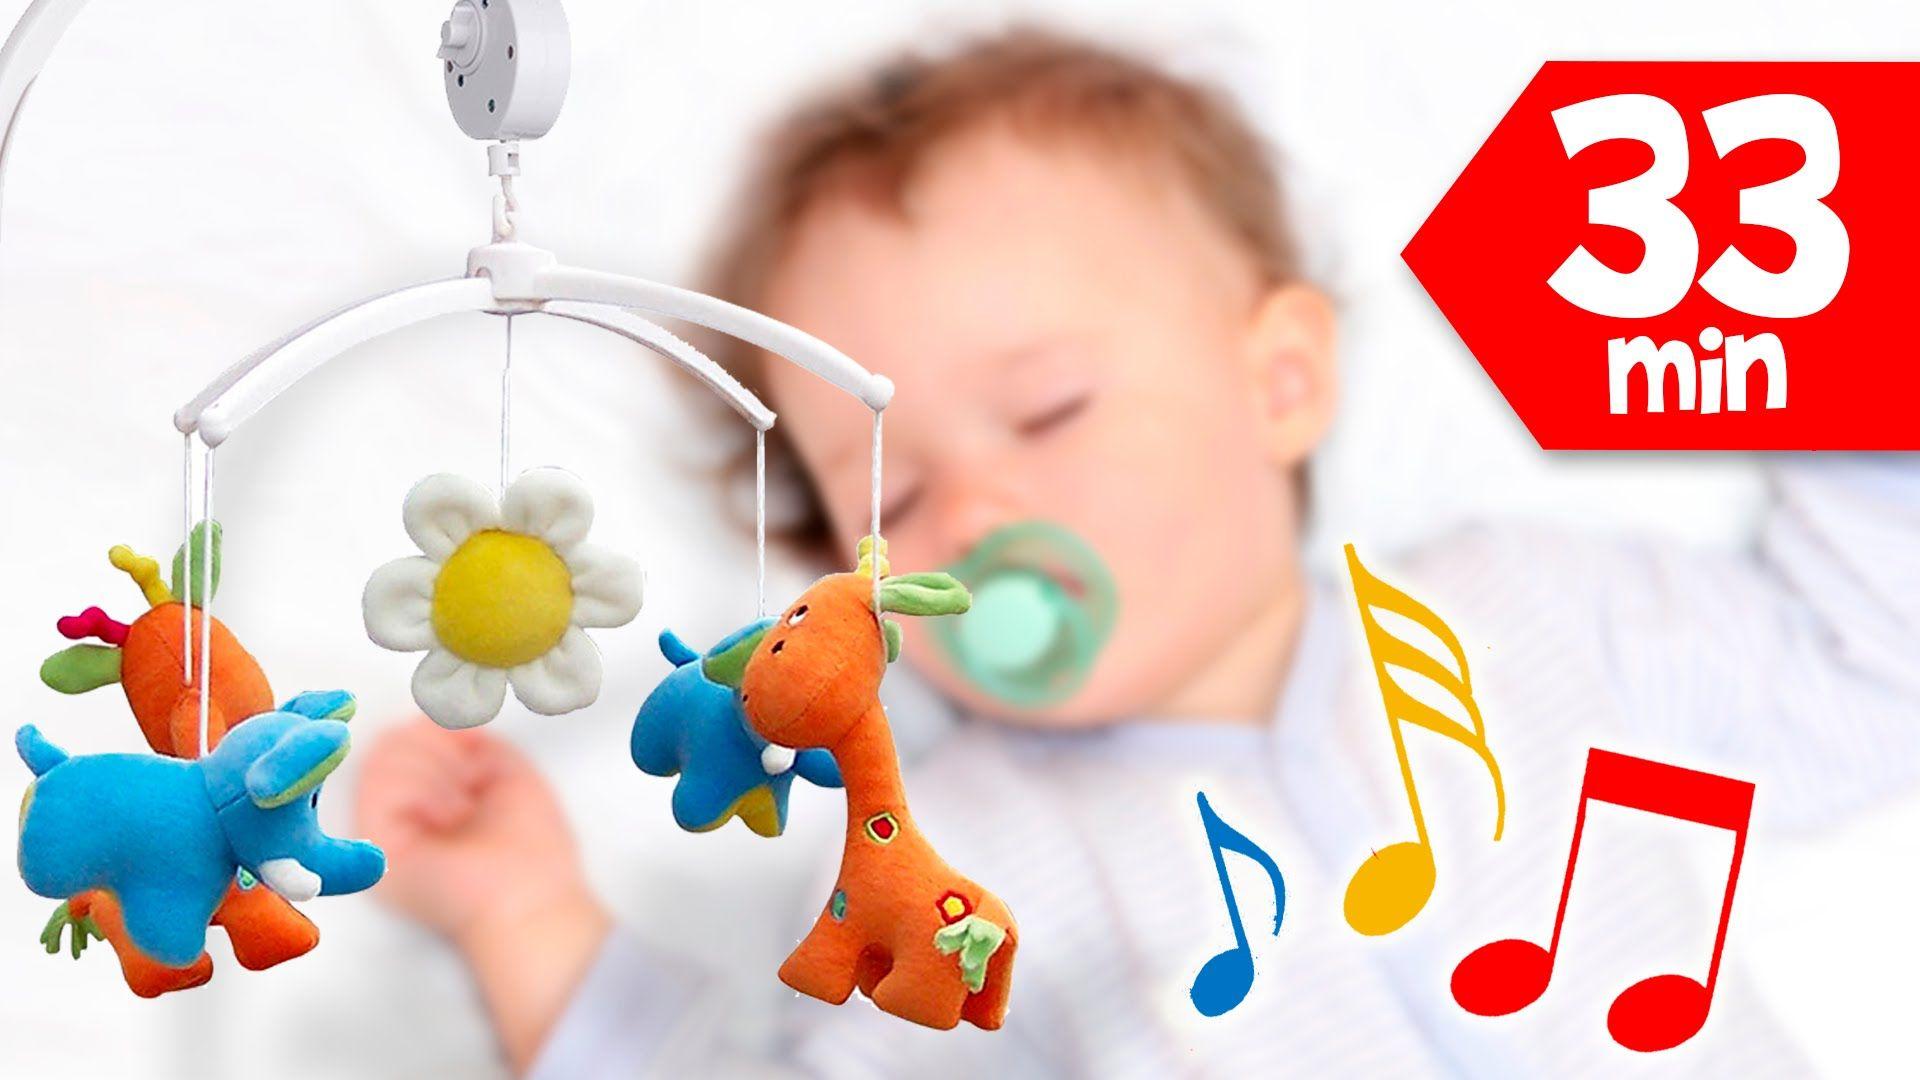 Cancion De Cuna Para Dormir Bebes 8 Temas Larga Duracion Musica Clasica Con Campanitas Twinkle Twinkle Little Star Baby Mobile Twinkle Twinkle